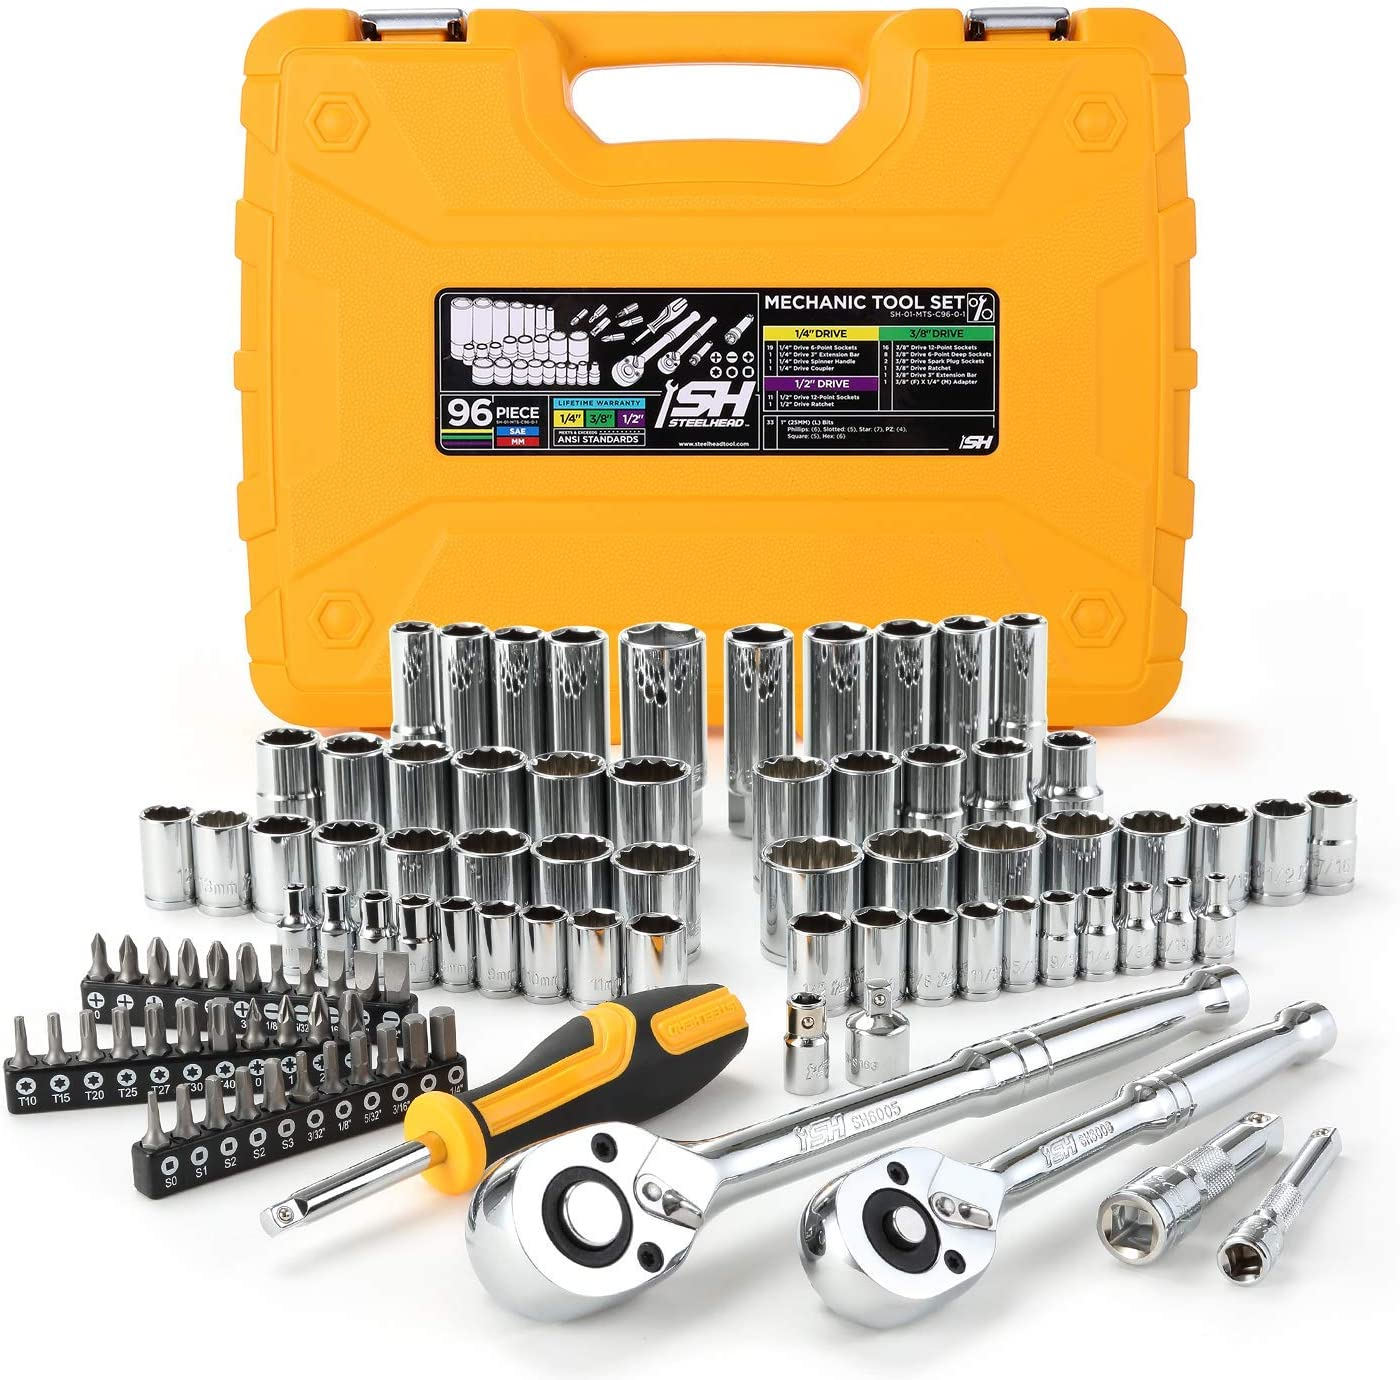 Steelhead 96件机械工具套接字设置